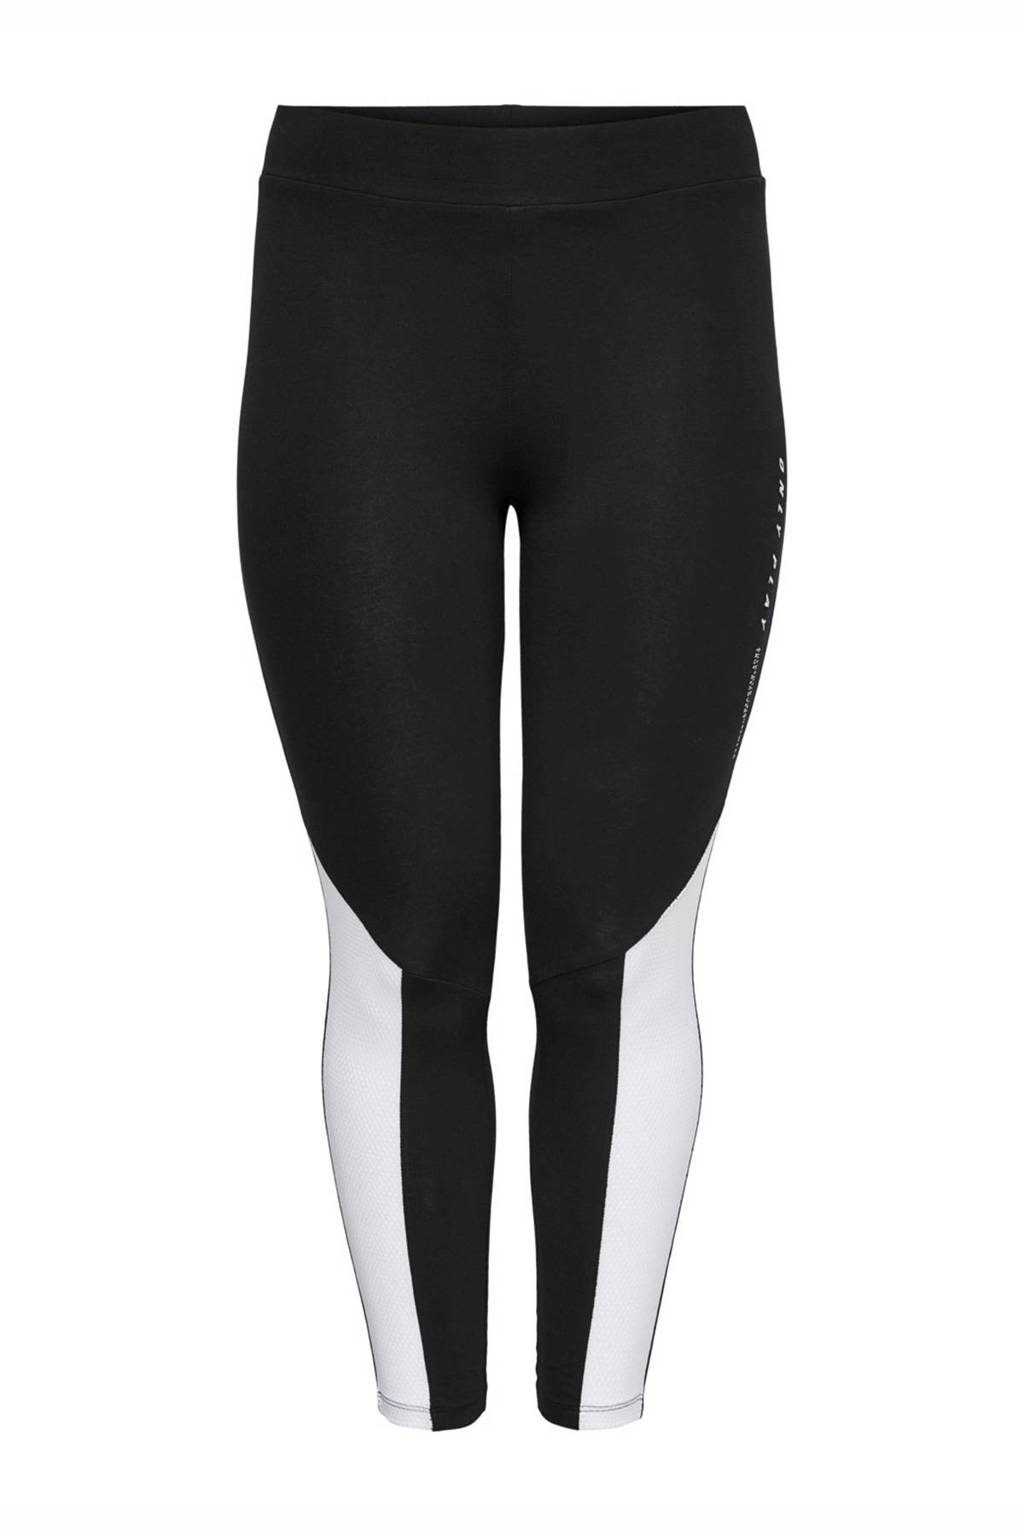 Only Play Curvy Plus Size 7/8 sportbroek zwart/wit, Zwart/wit